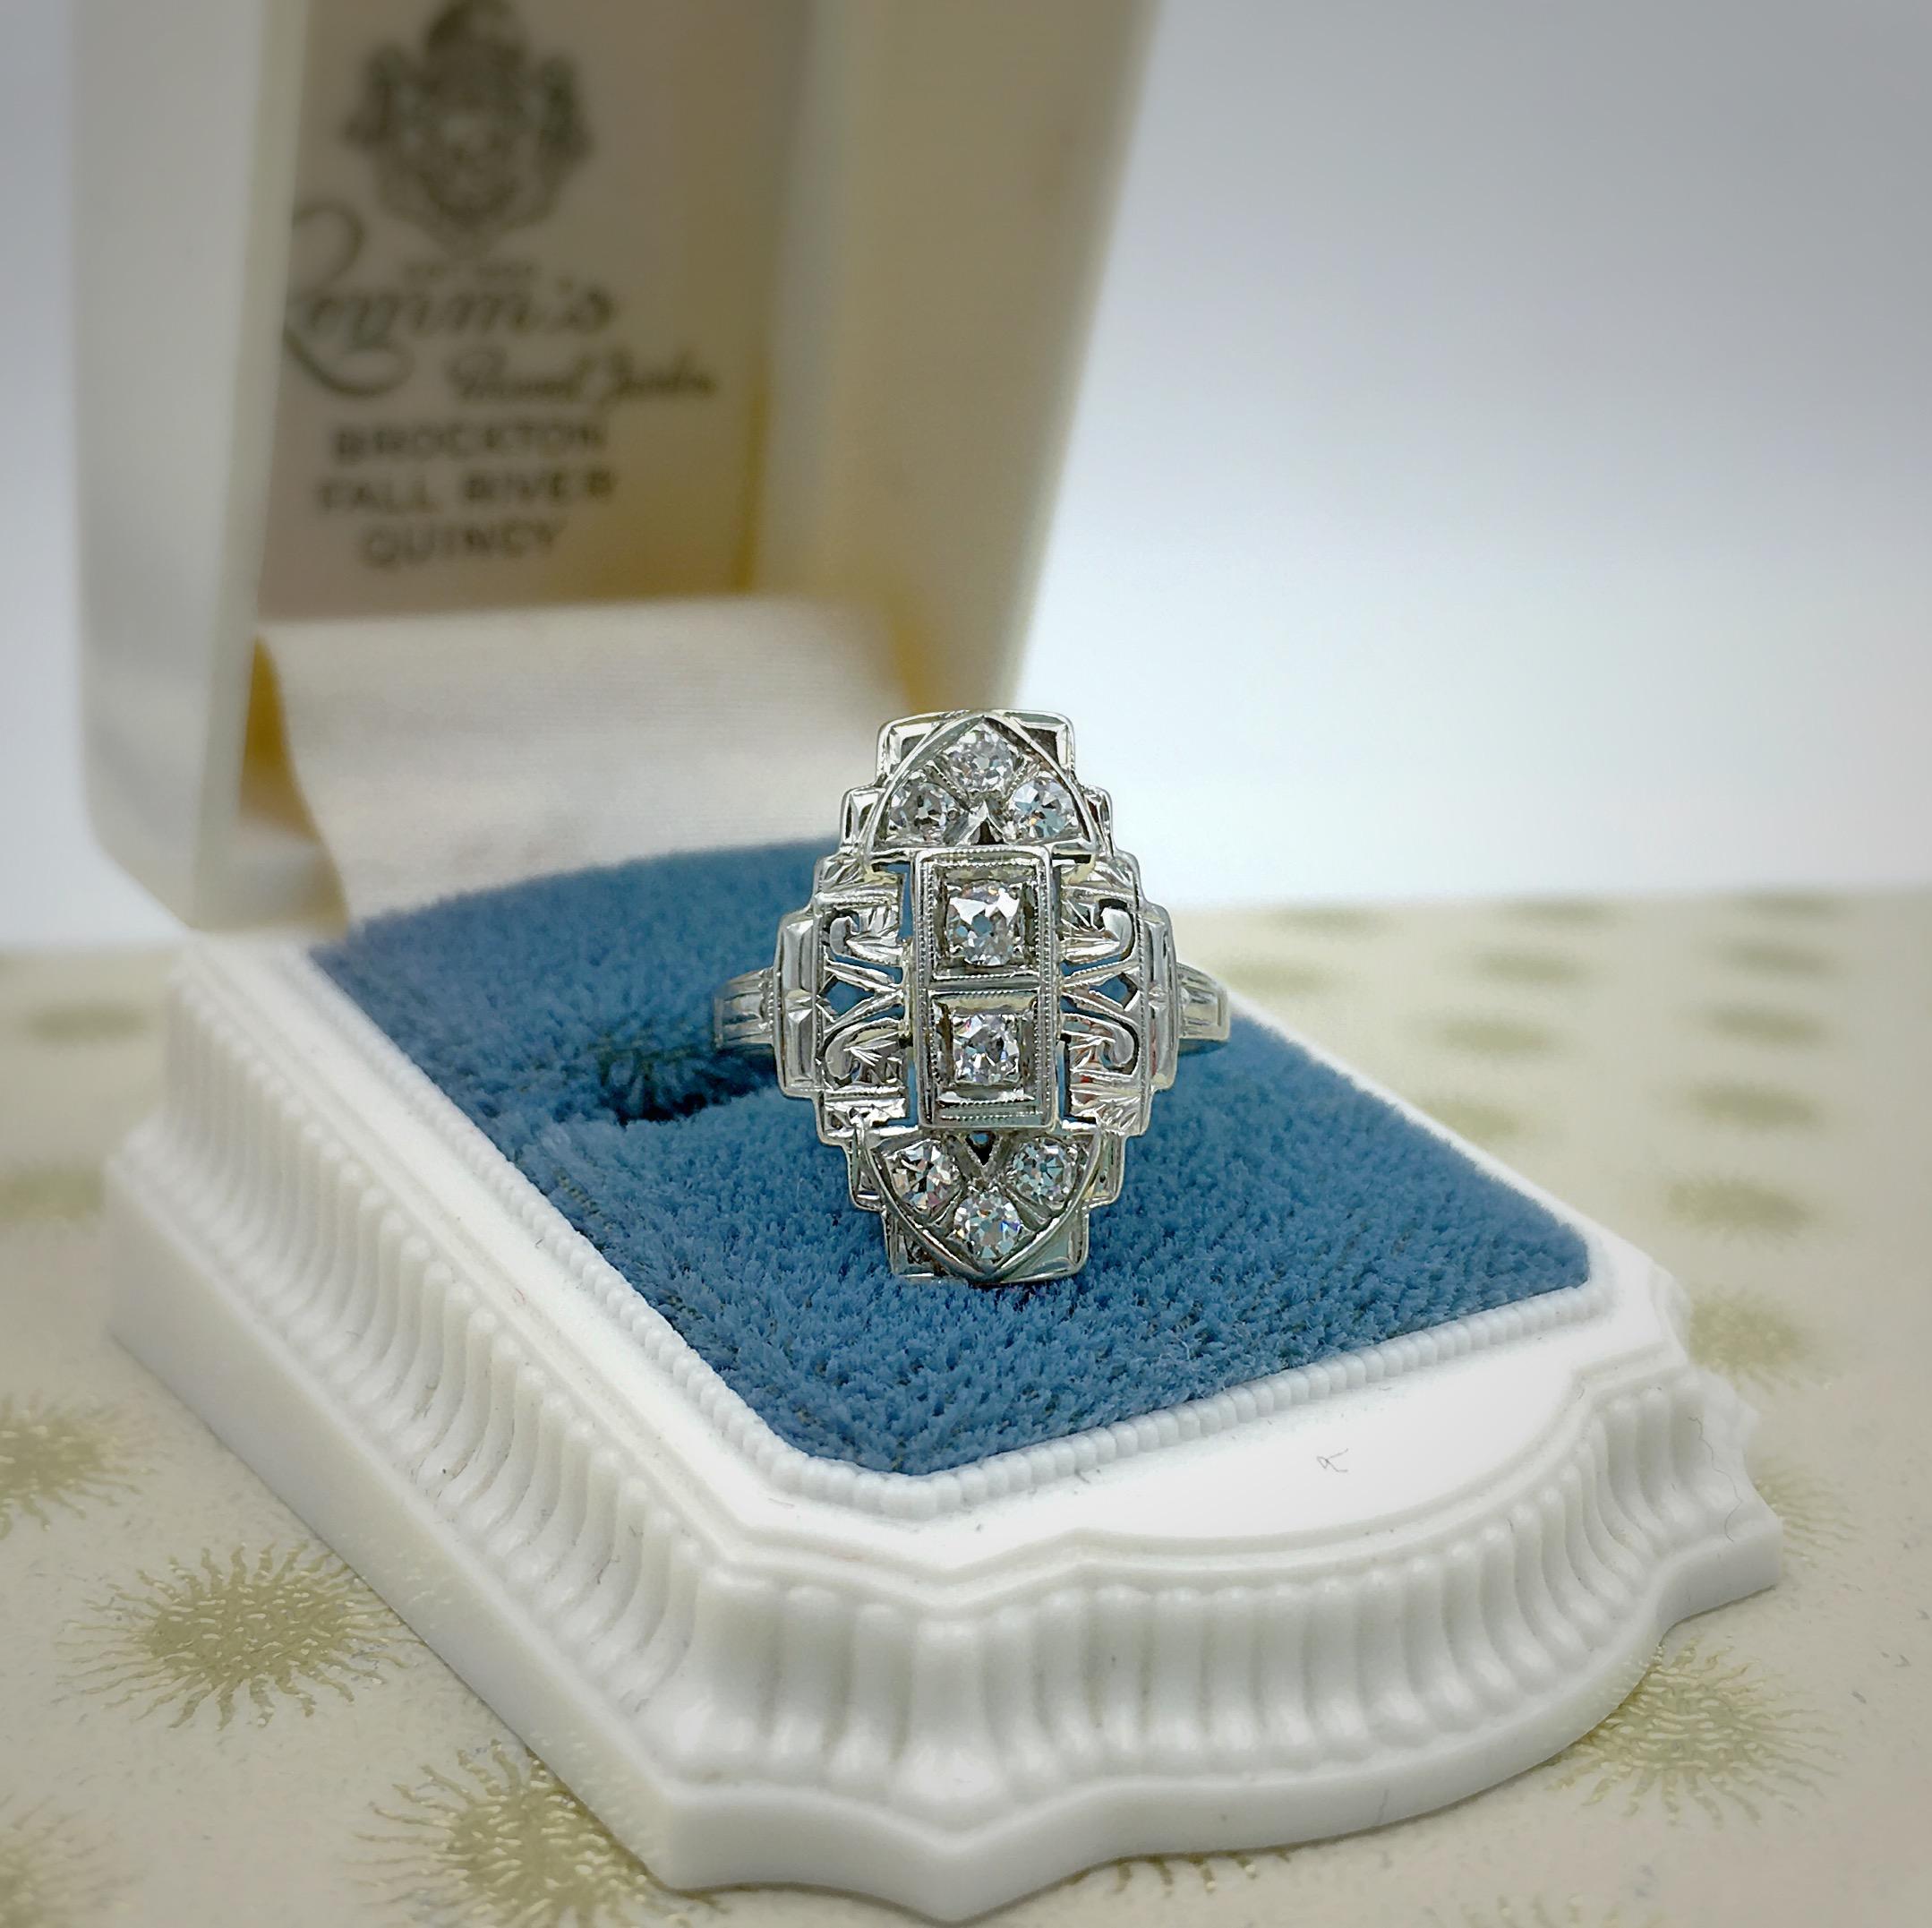 art deco dinner ring, reverie estate diamond jewelry nyc